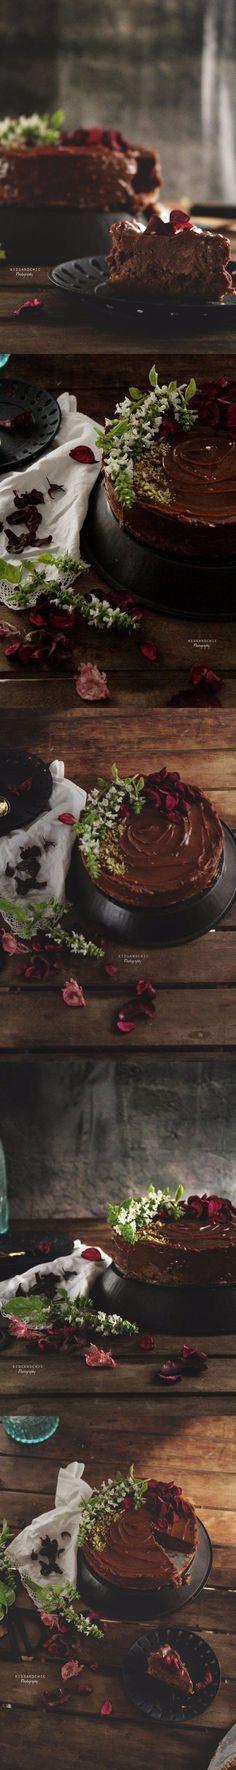 El más sabroso chees El más sabroso cheesecake de chocolate y dulce de leche / www.kidsandchic.es Recipe : http://ift.tt/1hGiZgA And @ItsNutella  http://ift.tt/2v8iUYW